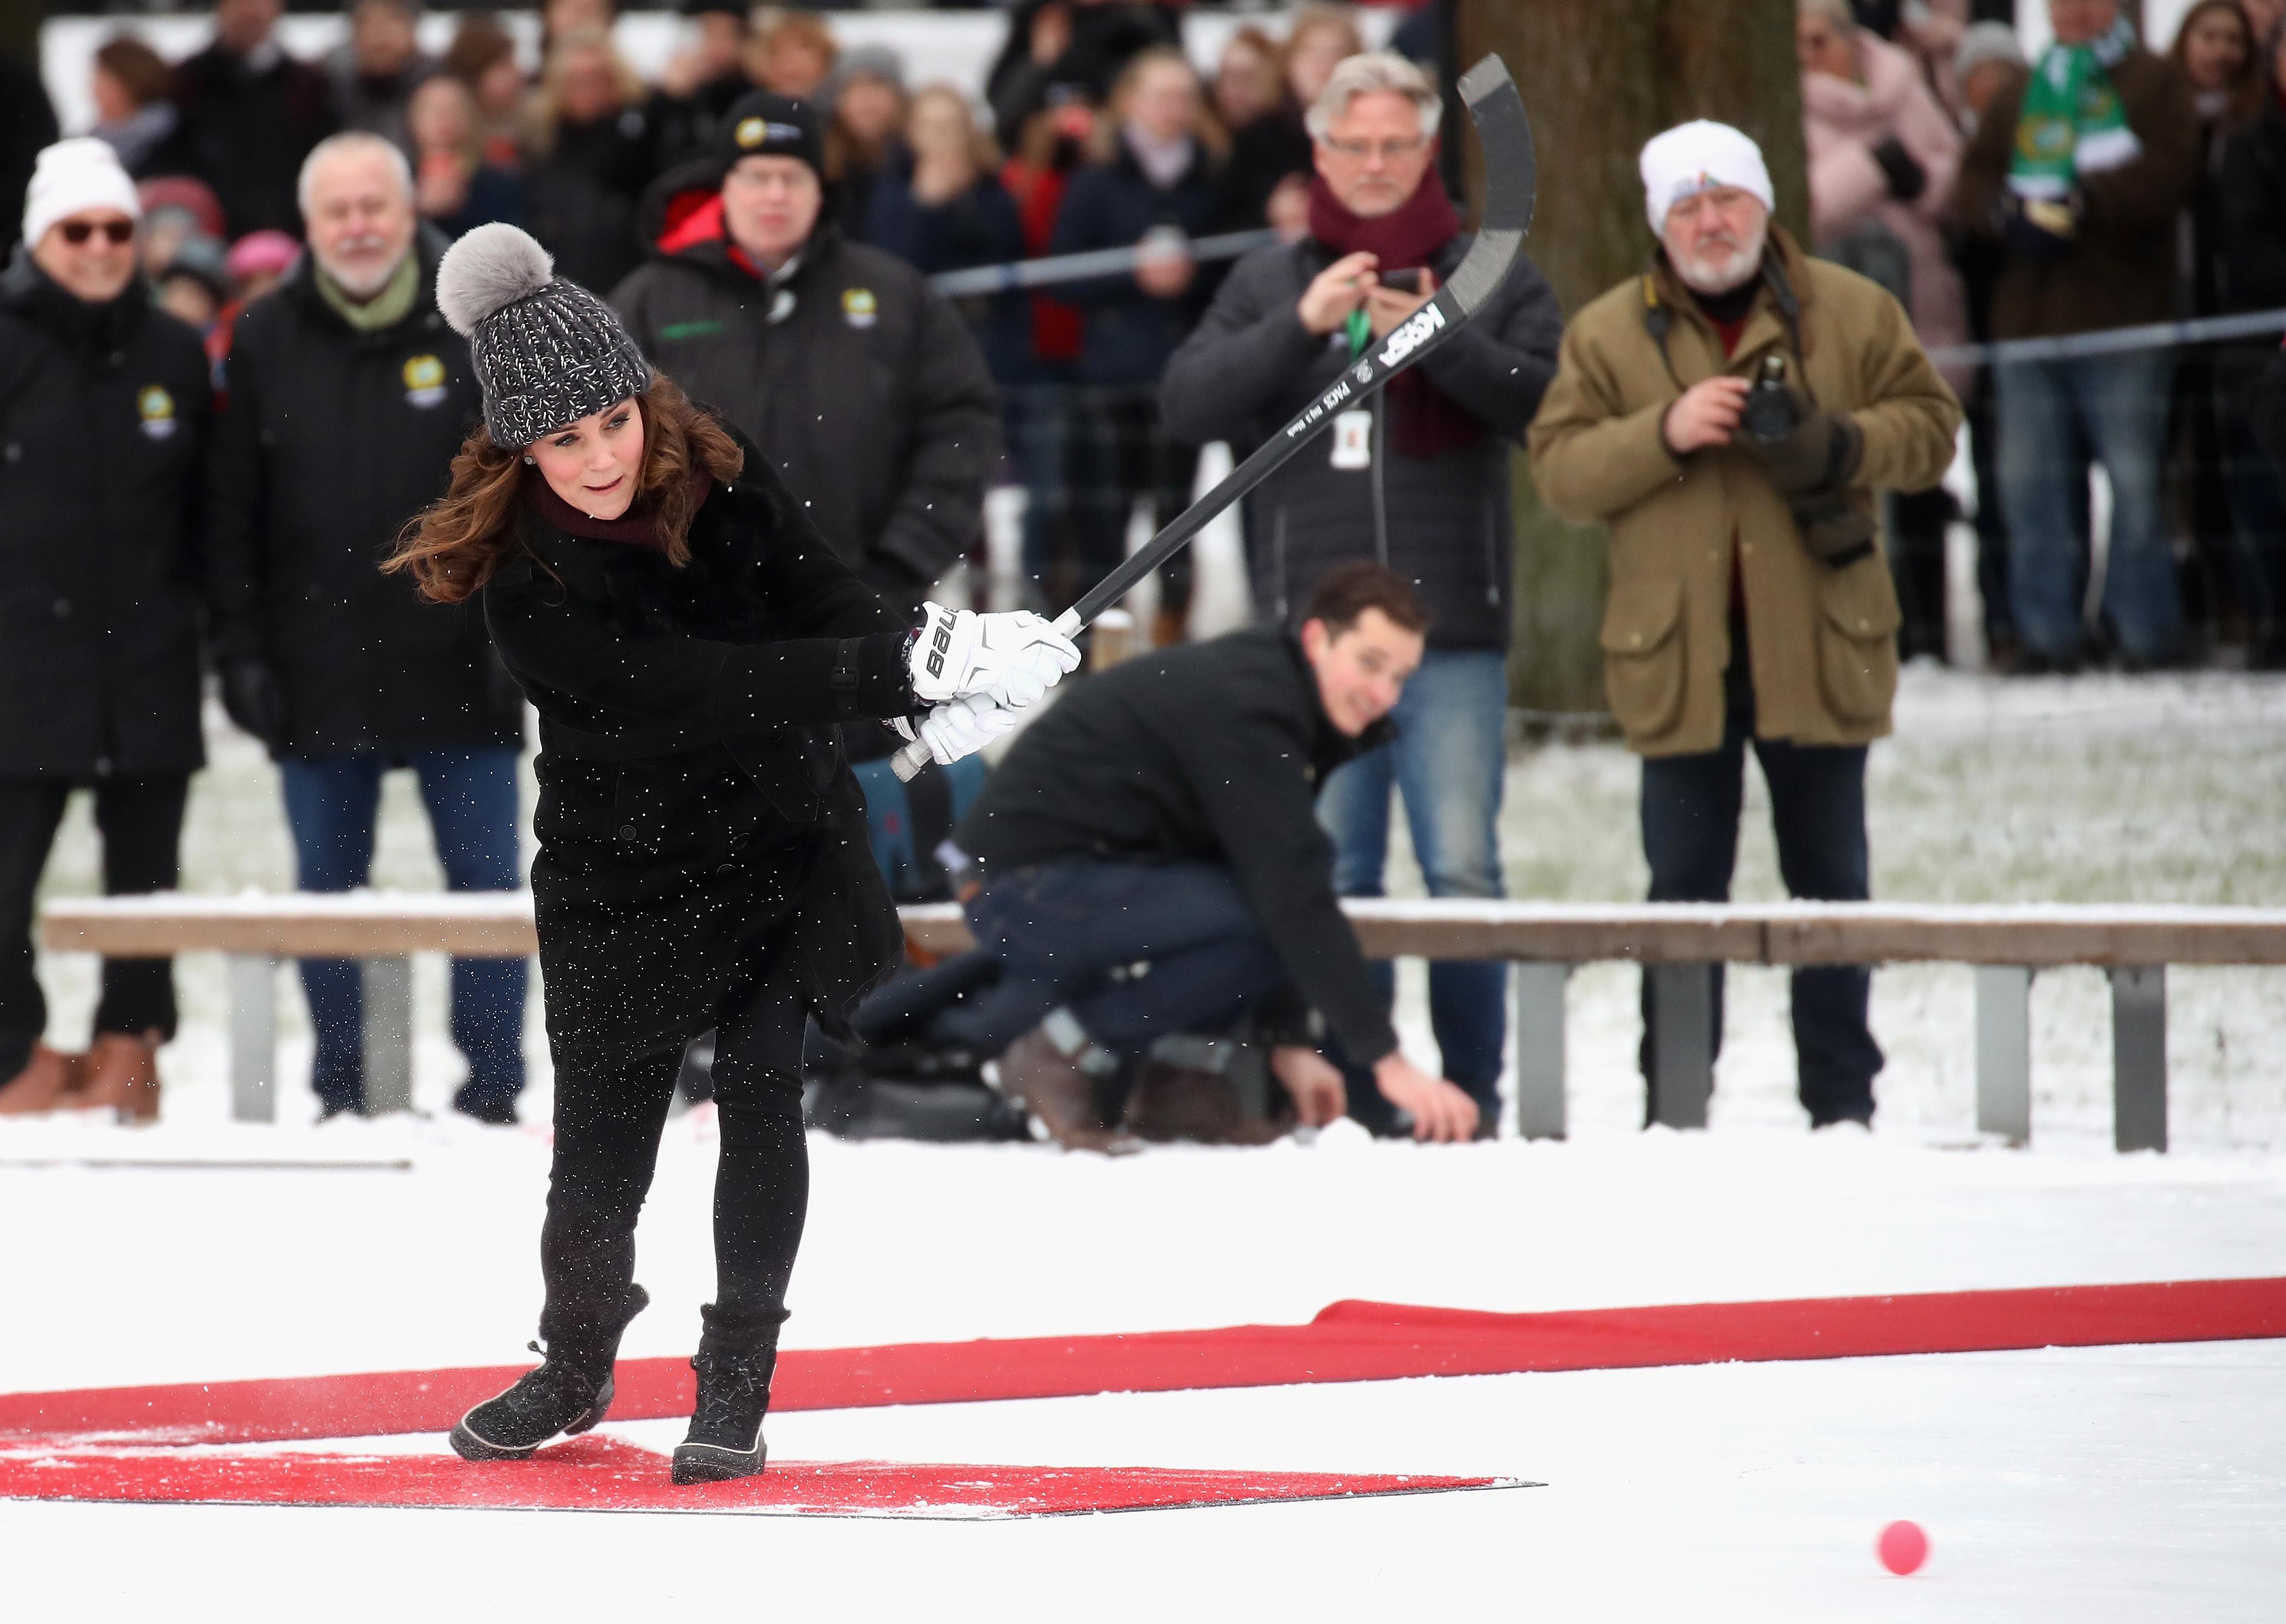 Catherine, Duchess of Cambridge attends a Bandy hockey match